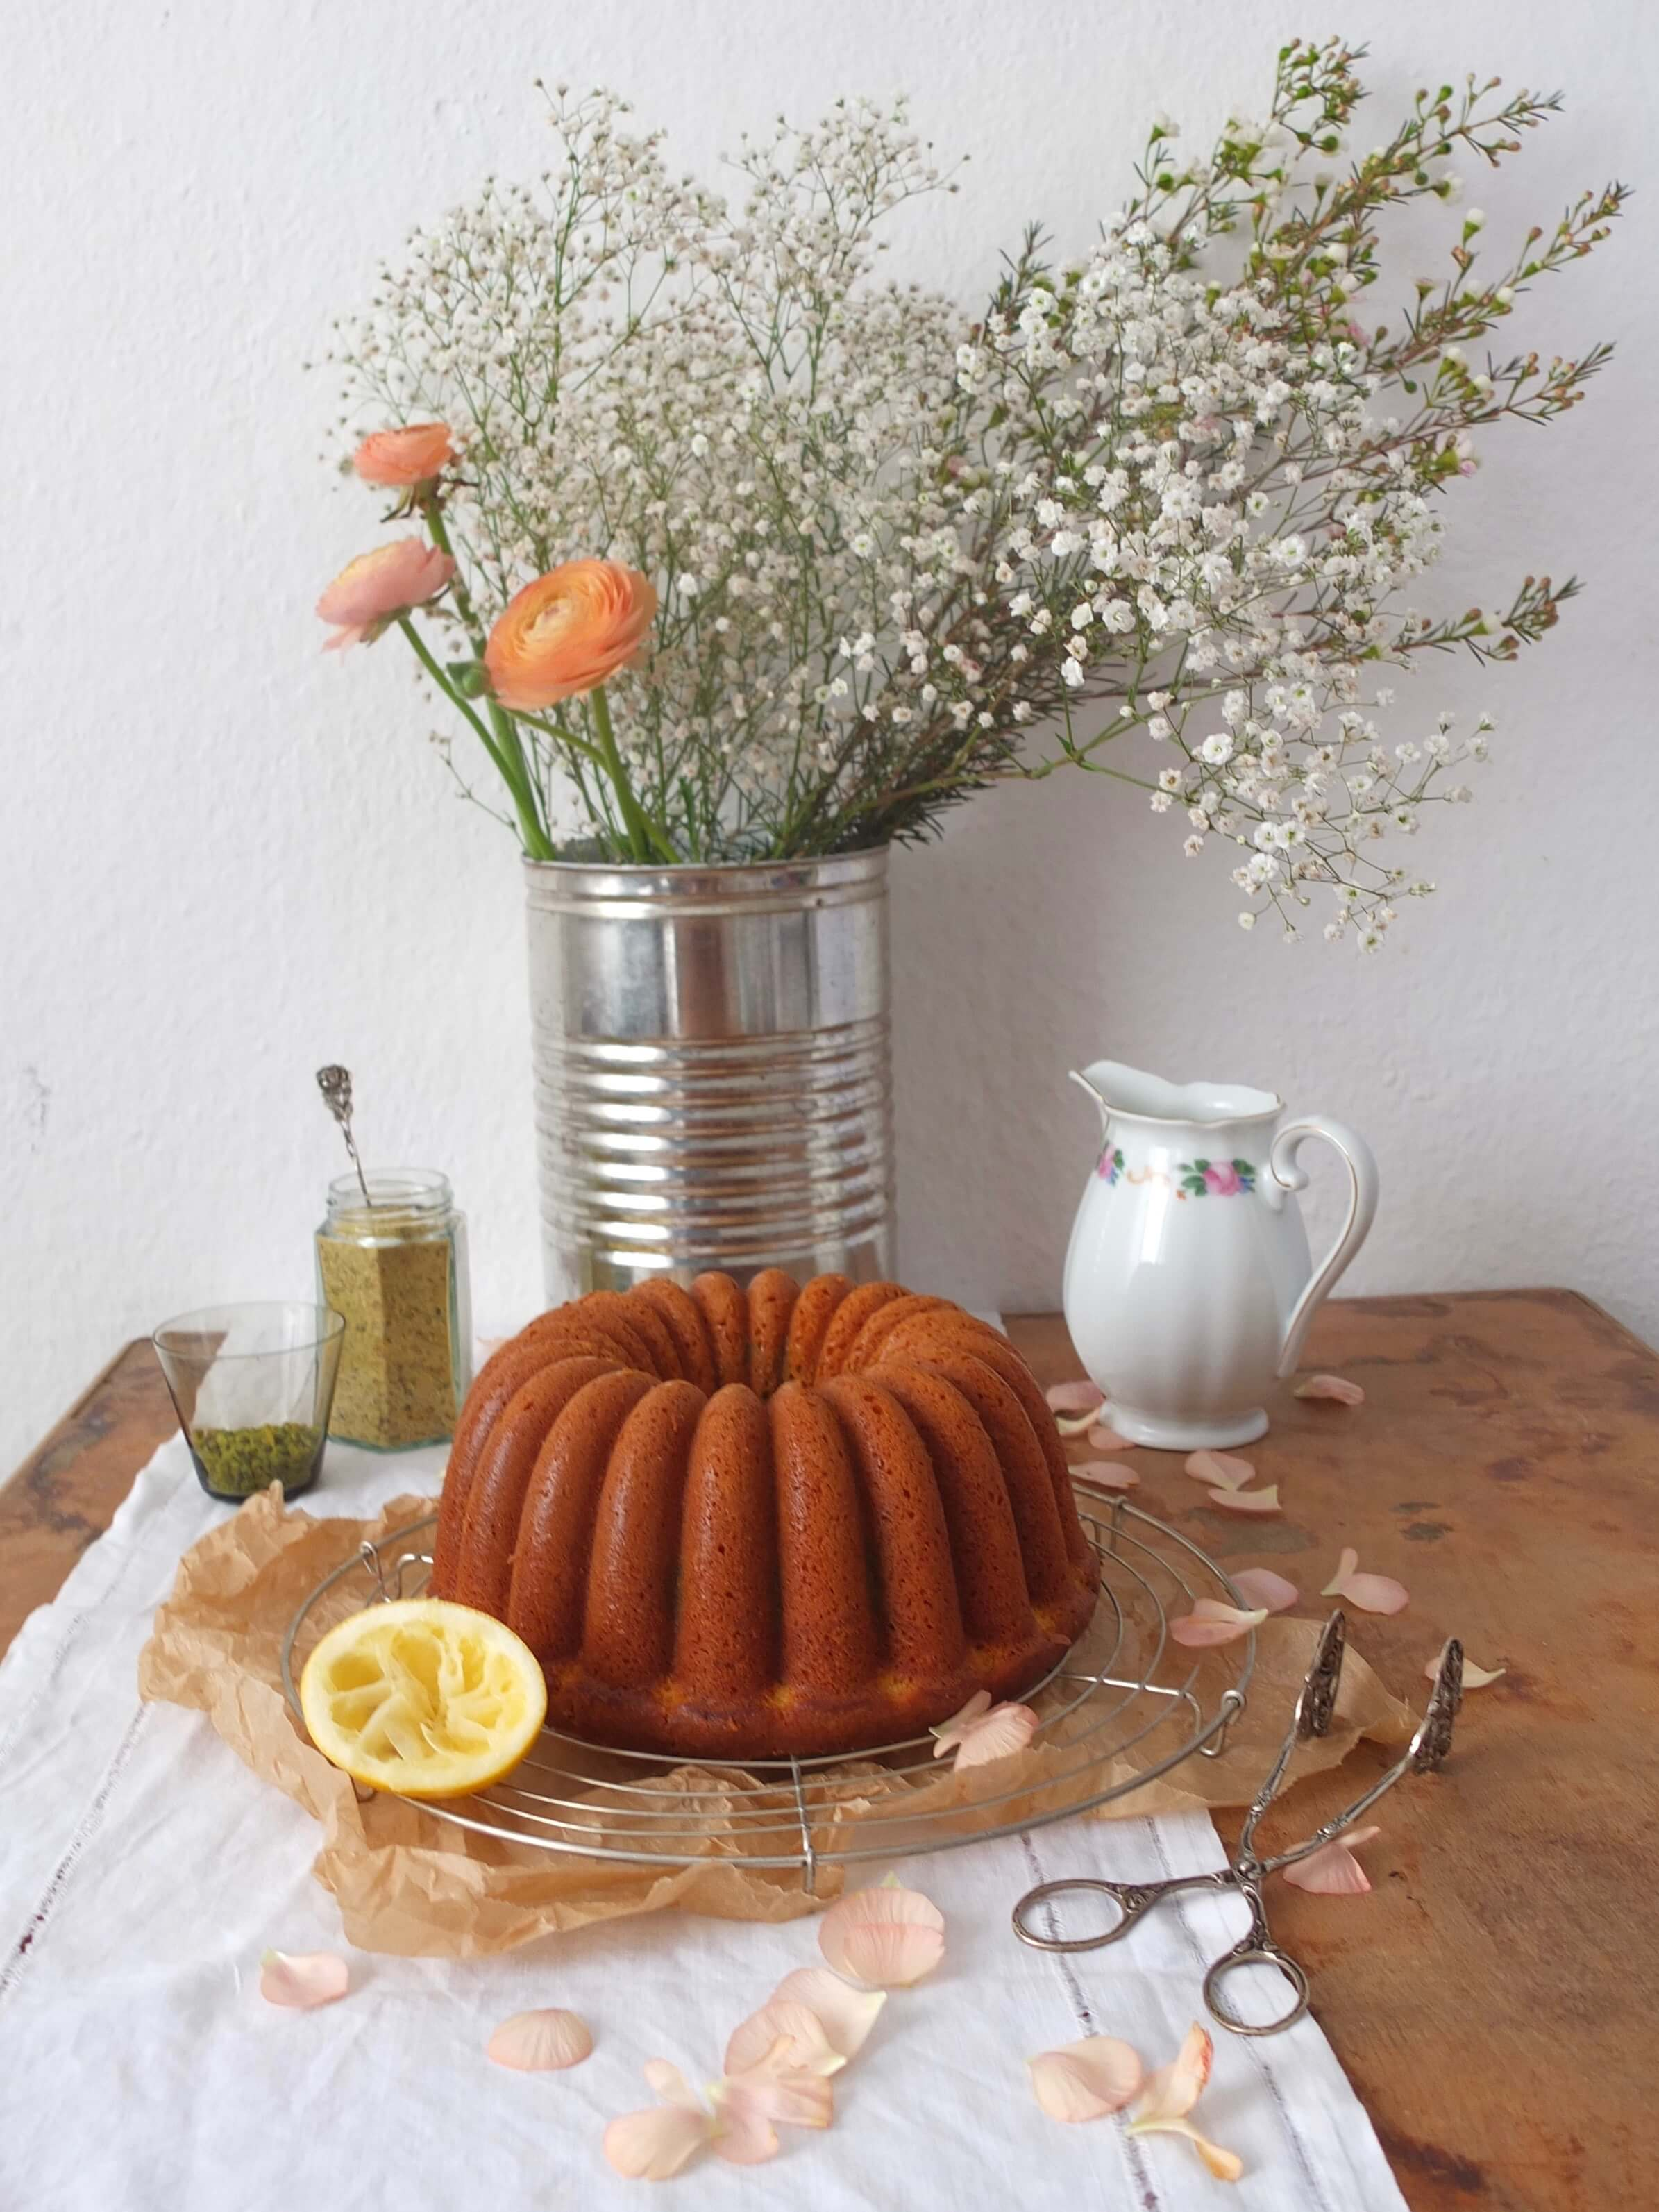 Joghurt-Matcha-Gugelhupf | La Crema Patisserie Food- und Backblog